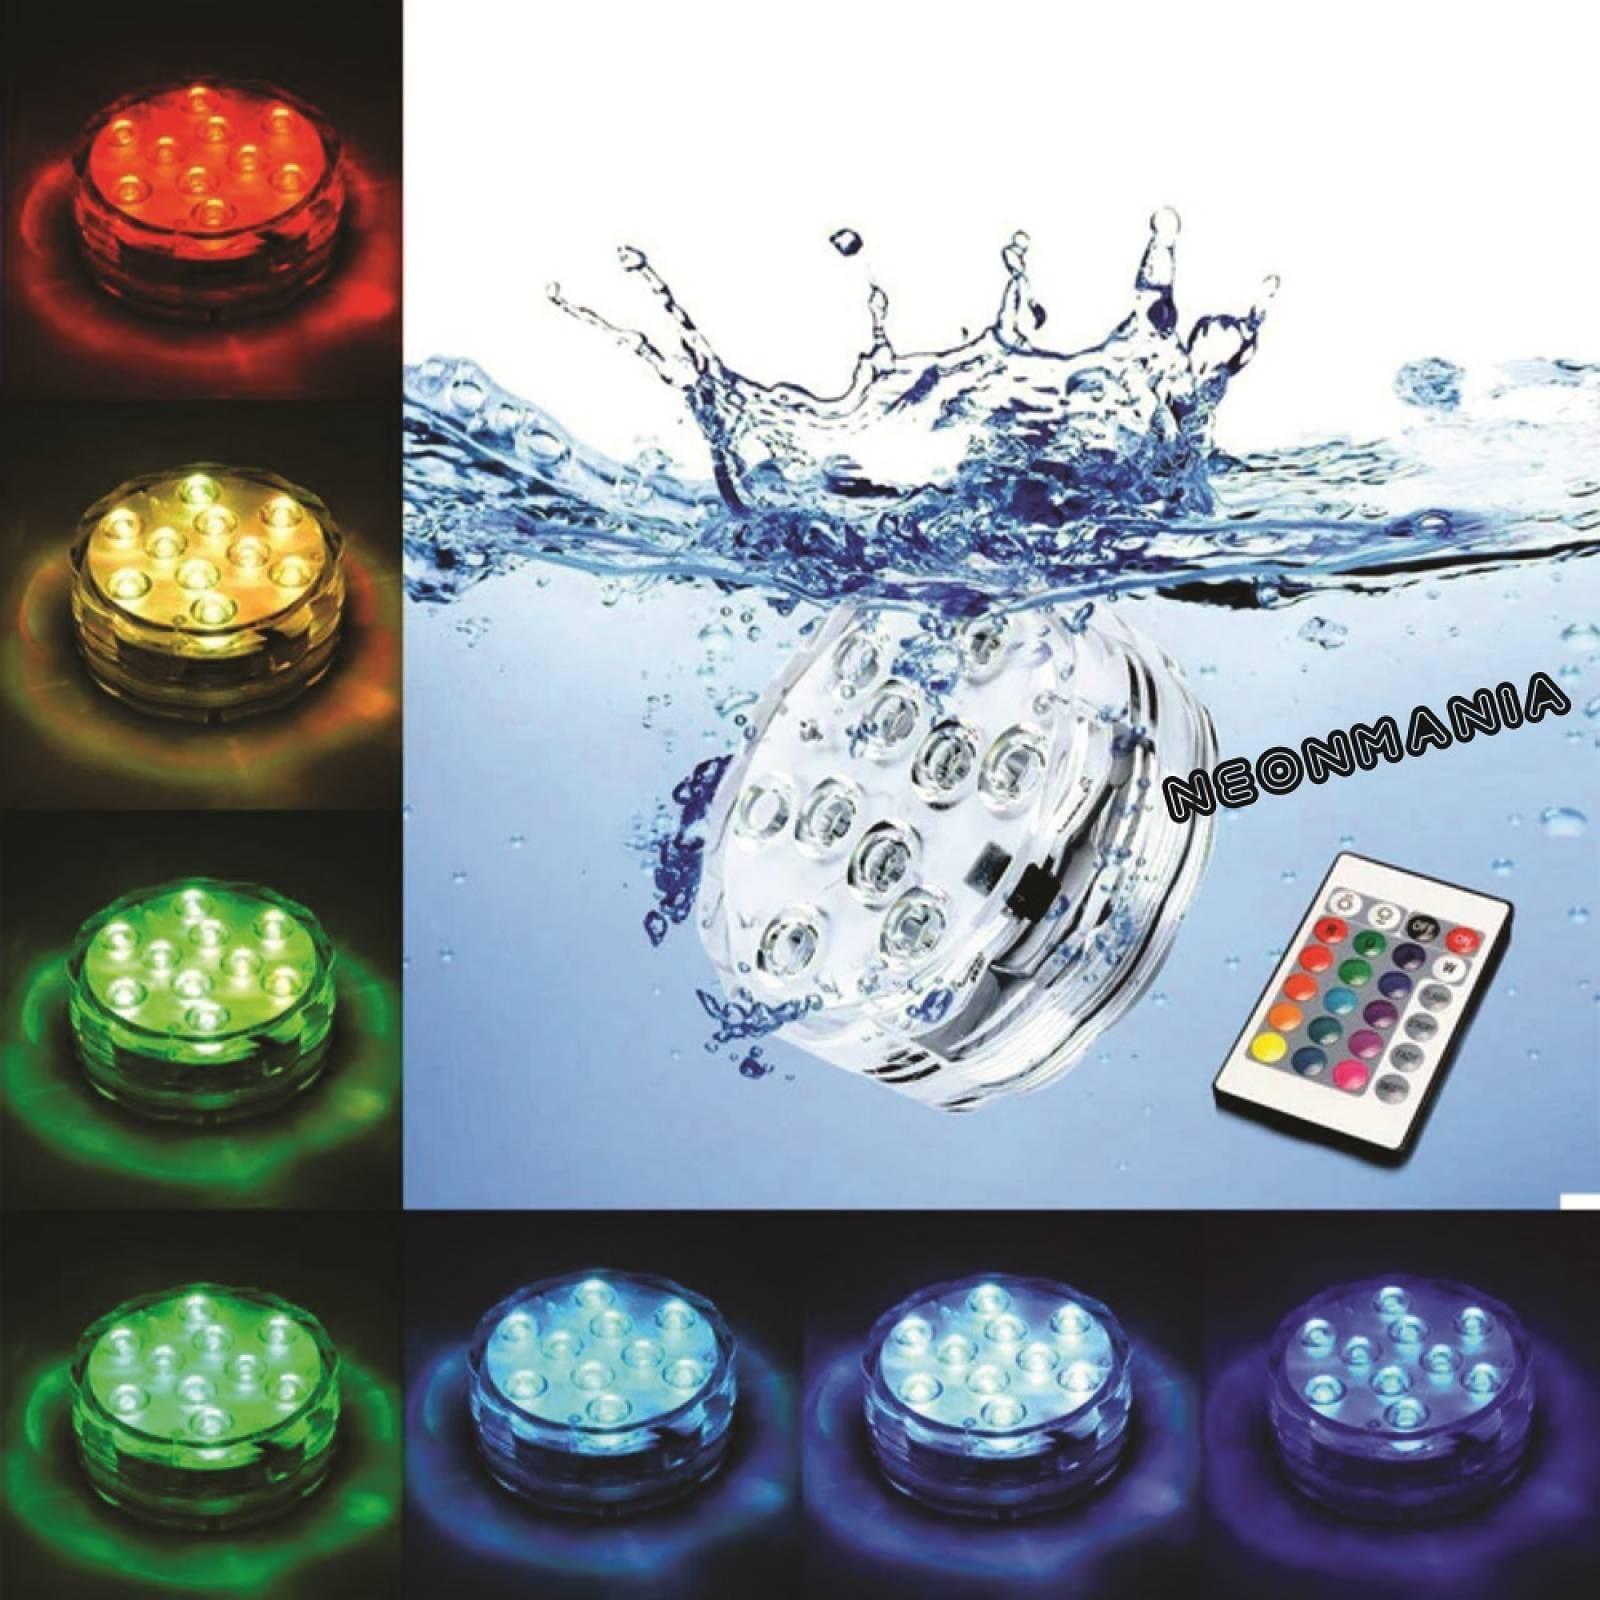 BASE LAMPARA RGB 10 LED SUMERGIBLE CONTROL REMOTO DECORACION